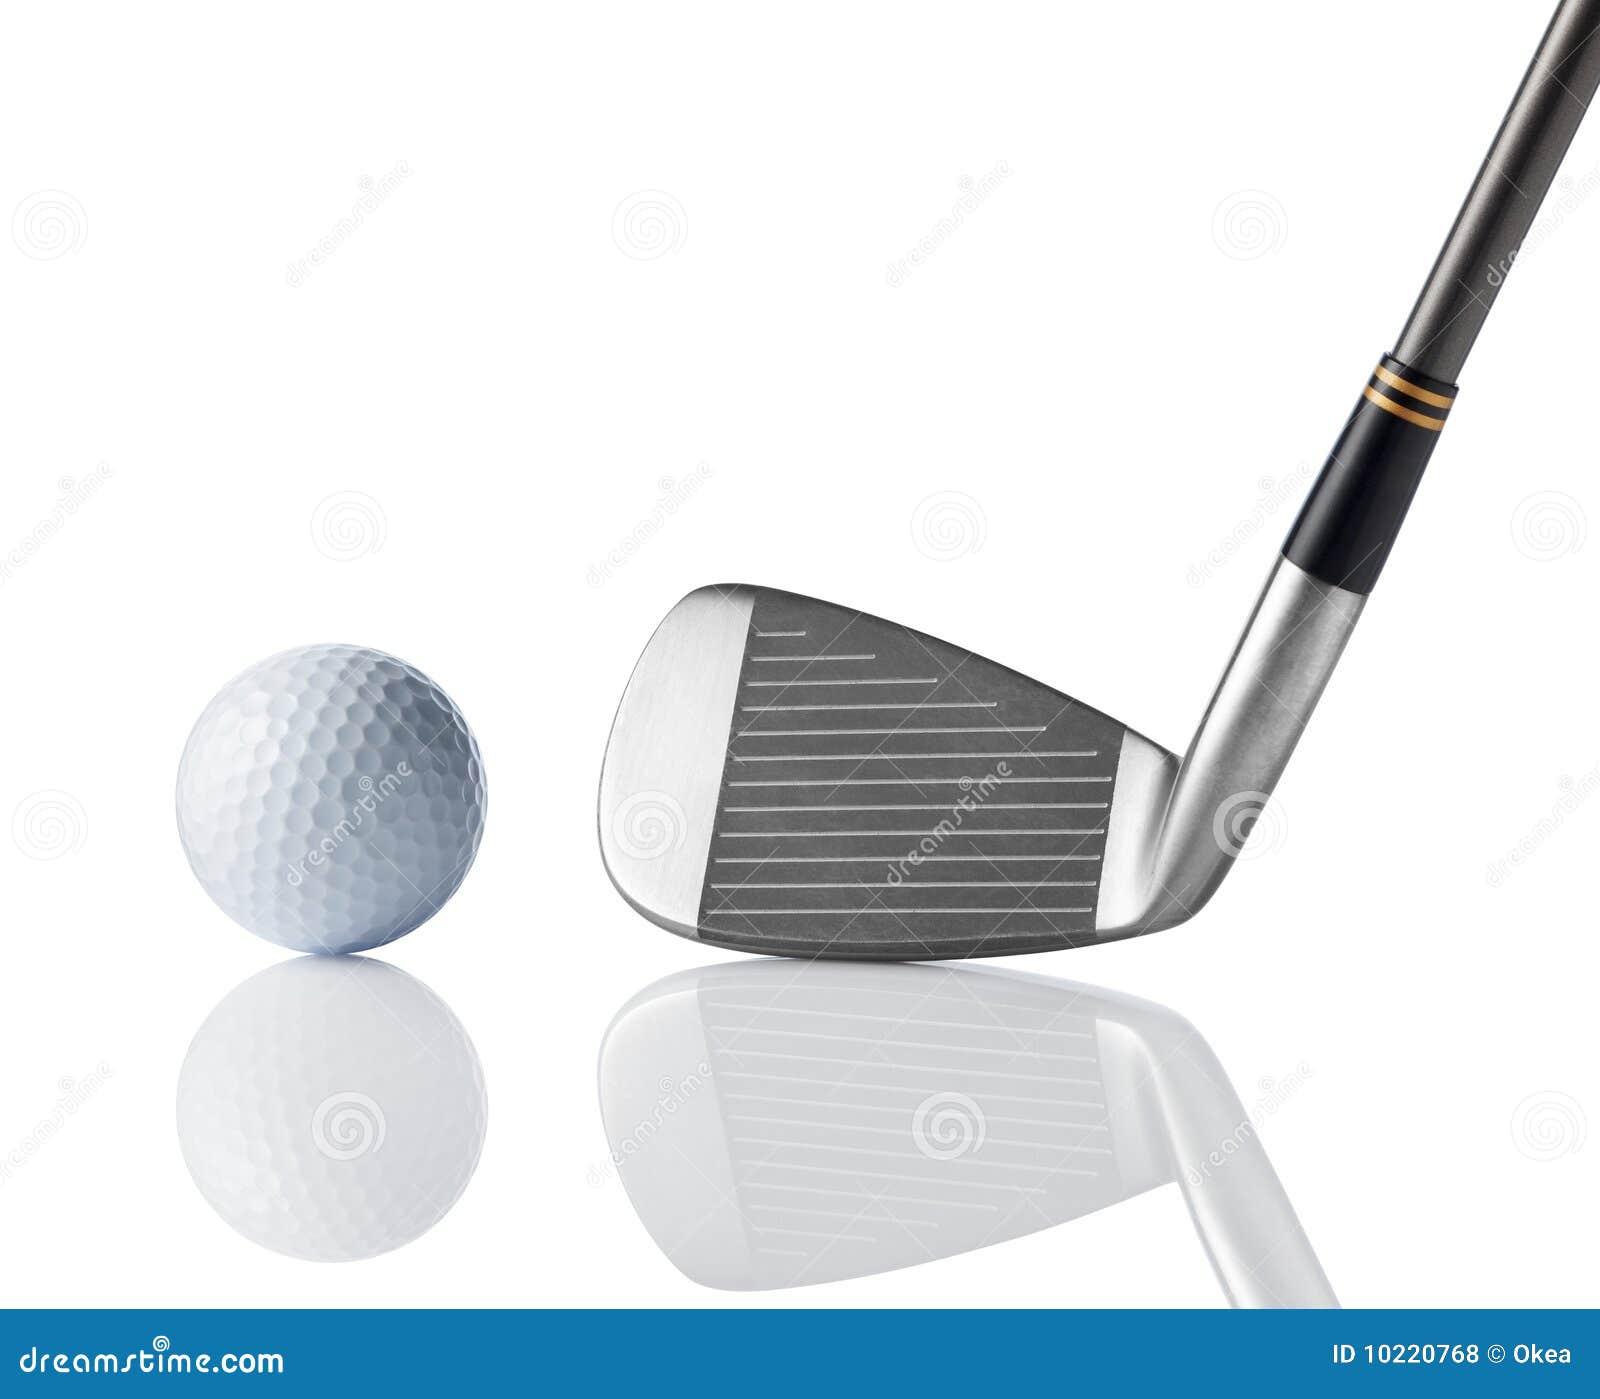 Golf Club And Golf Ball Royalty Free Stock Photos - Image: 10220768 Golf Ball On Tee Clipart